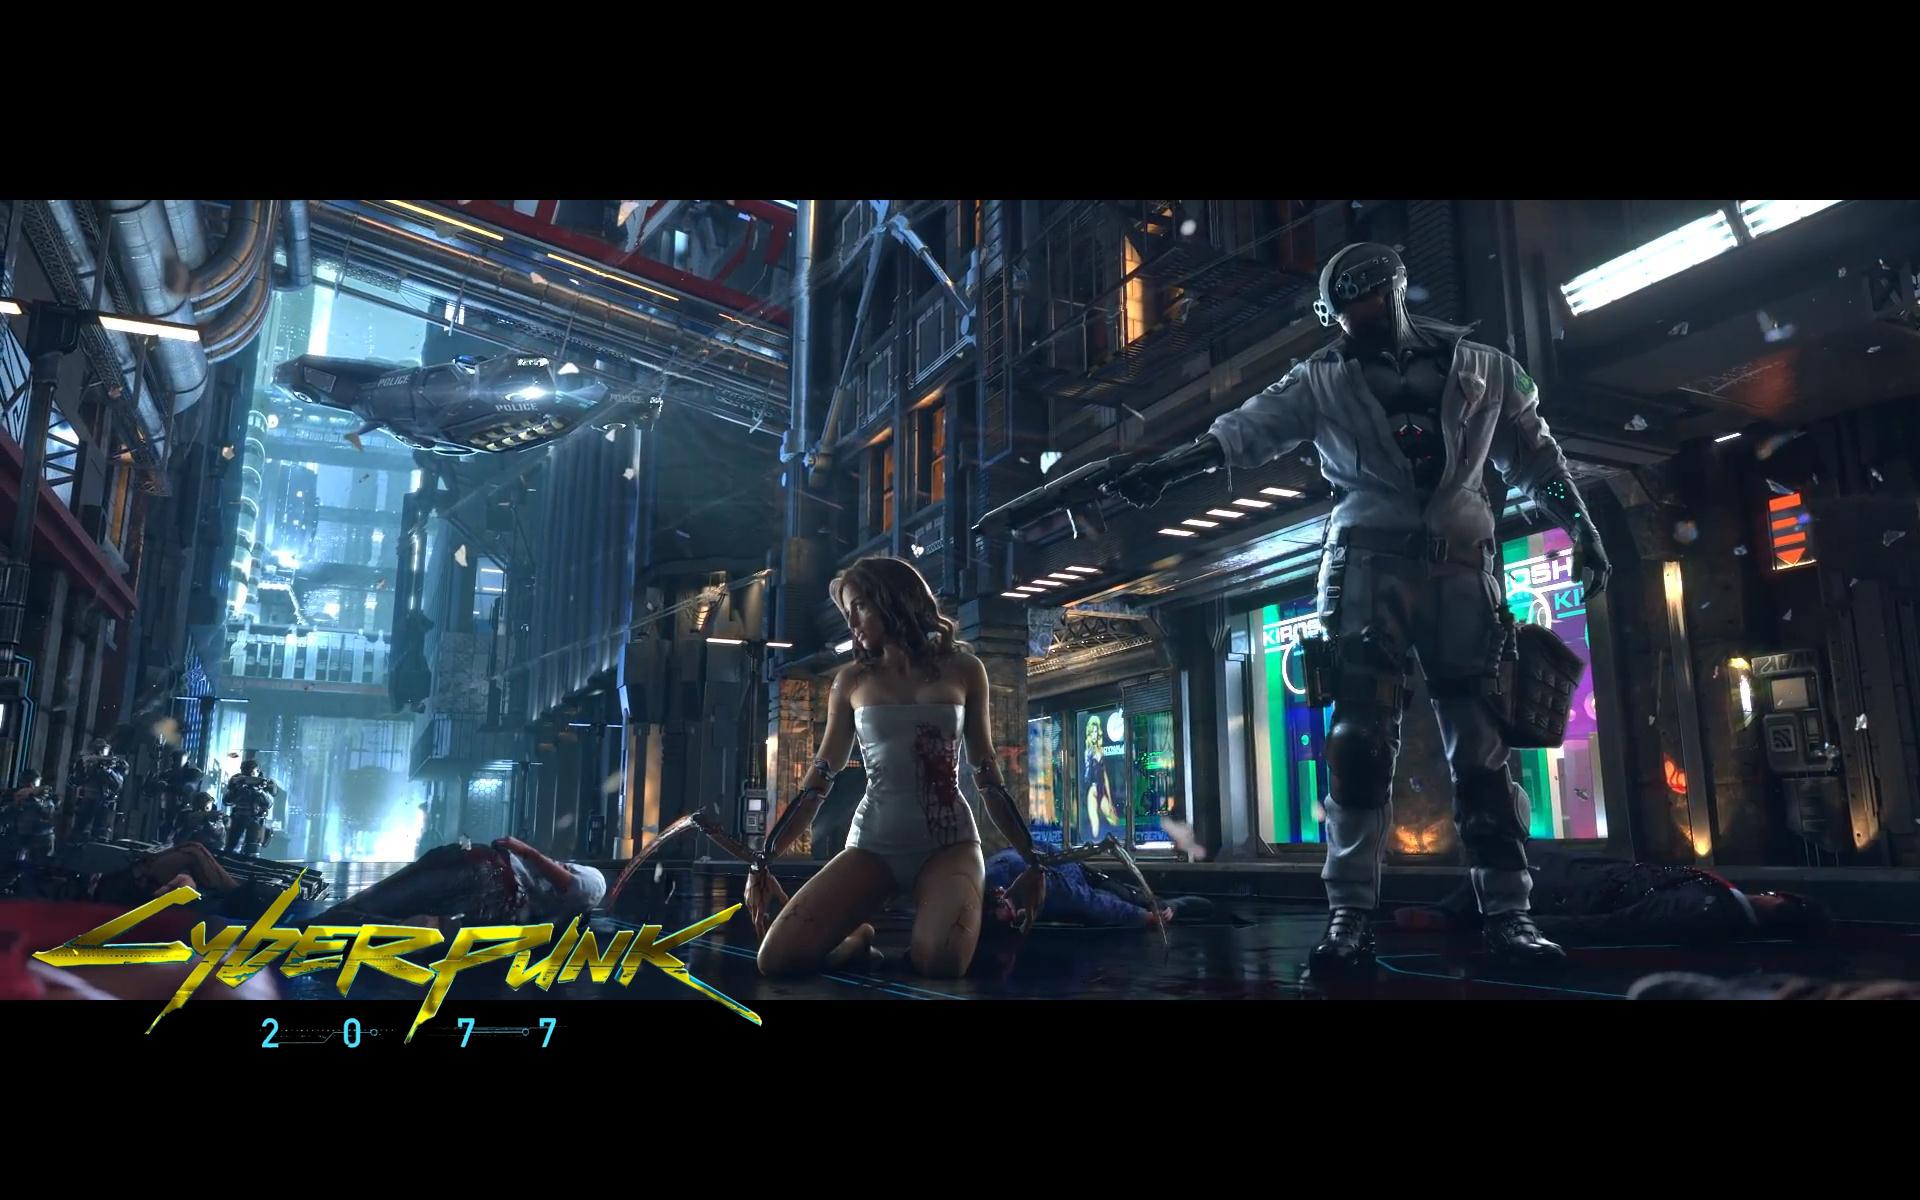 Cyberpunk 2077 Wallpaper by DarkangelUK on deviantART 1920x1200